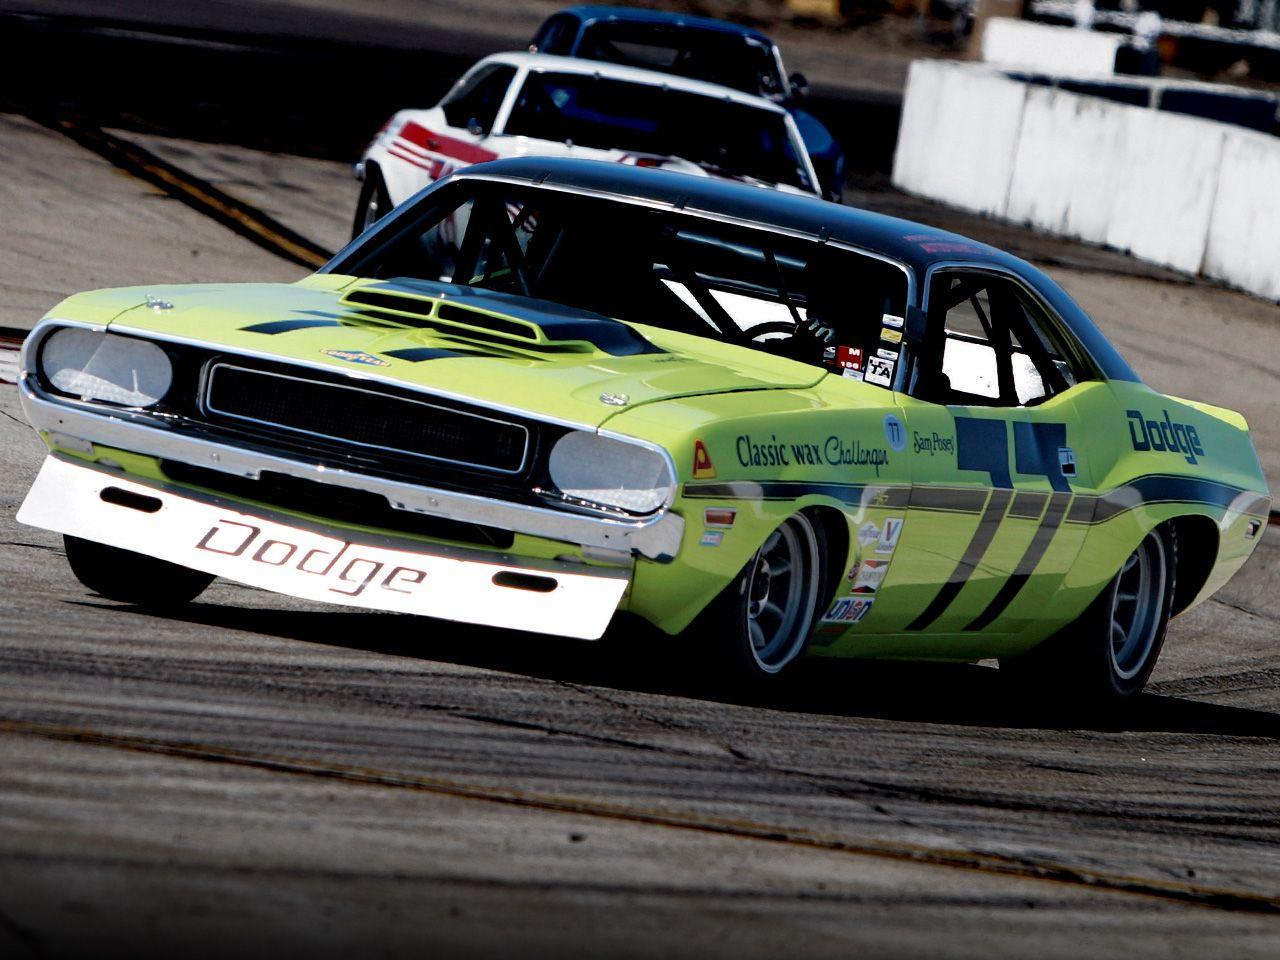 images of 1970 trans am class race cars | Dodge Challenger Trans-Am ...